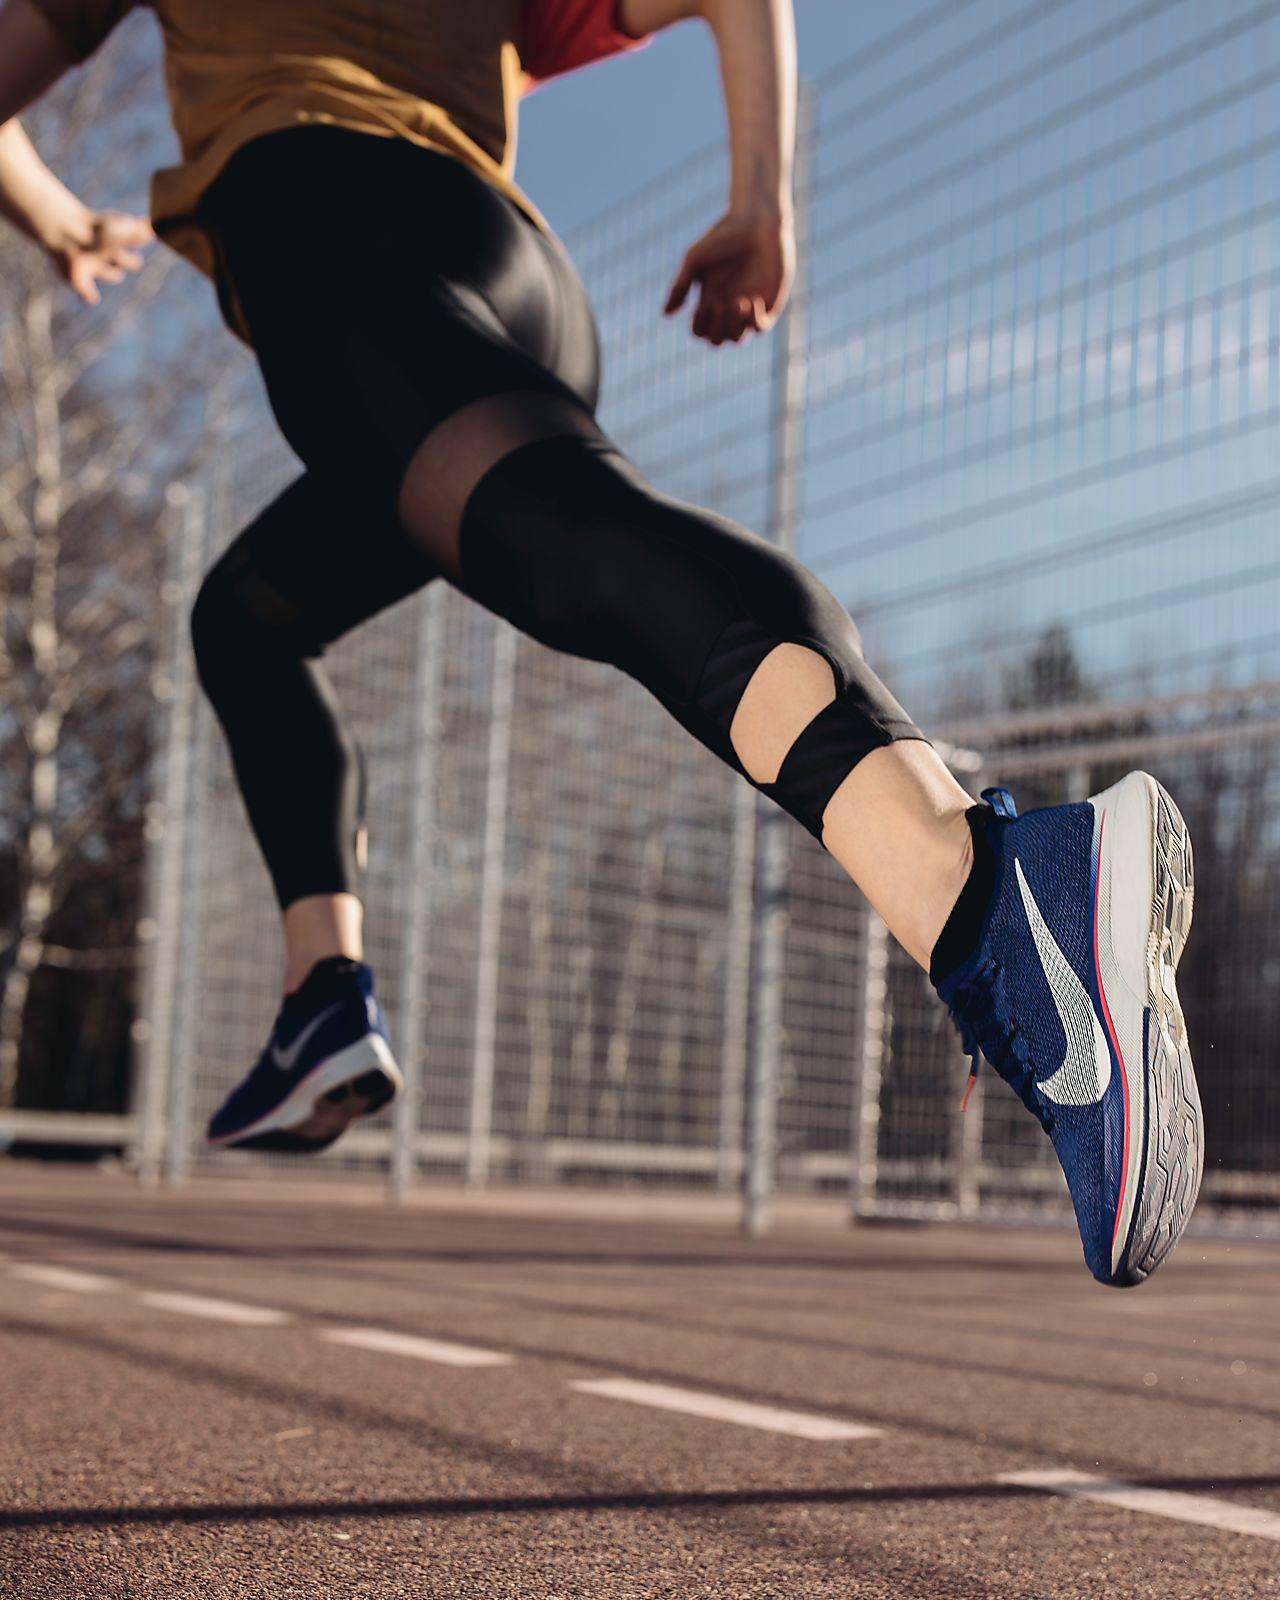 6fce1e5b404823 Nike Vaporfly 4% Flyknit Running Shoe. Nike.com